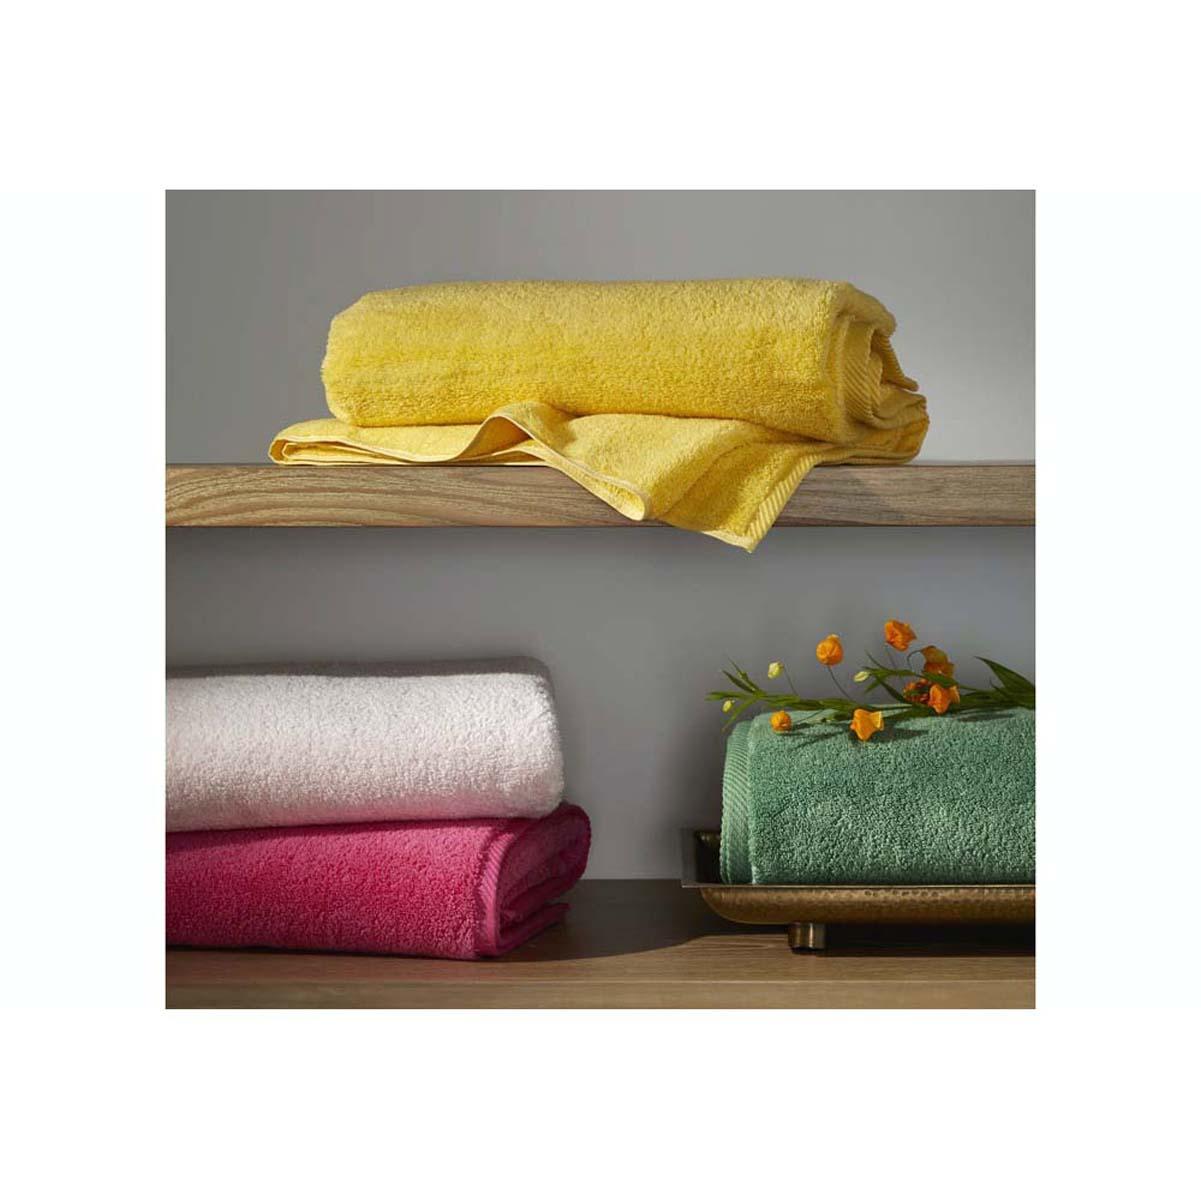 Set of 4 Mineral Matouk Milagro Bath Towel